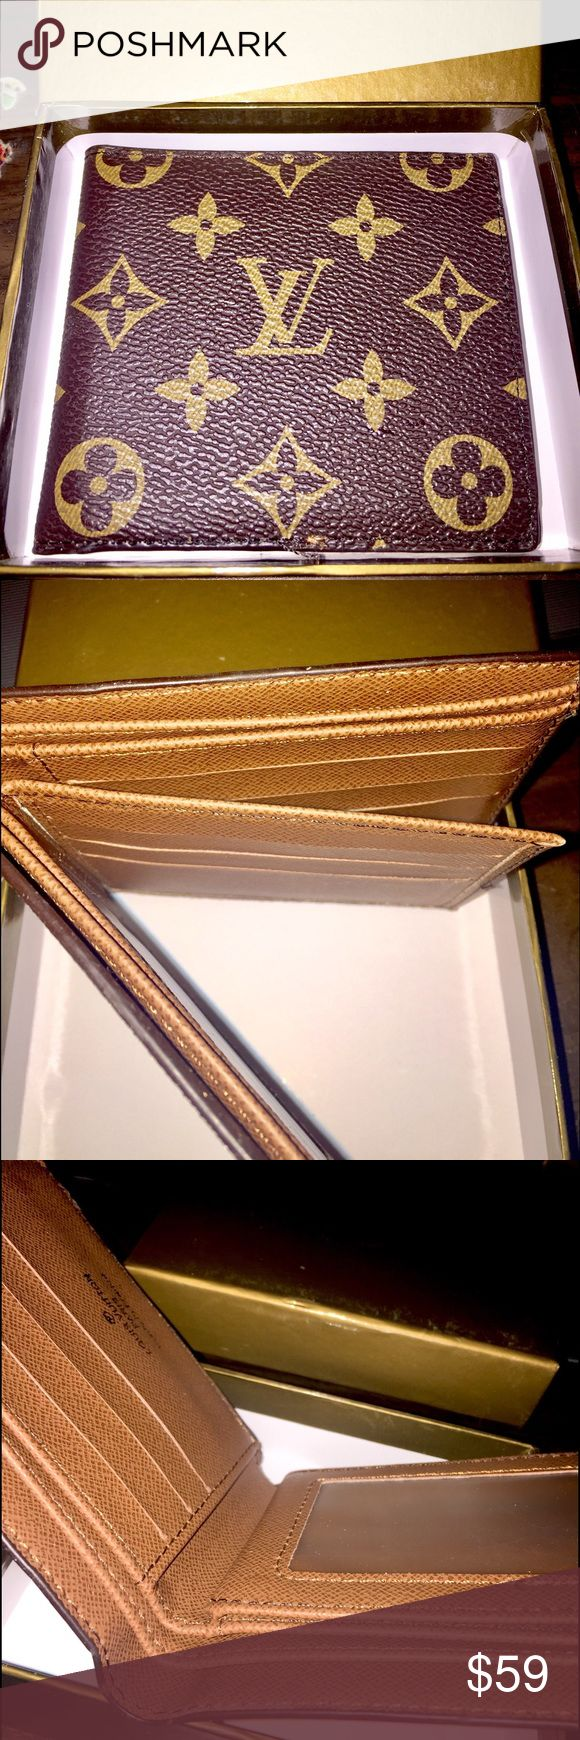 Louis Vuitton Wallet New brown Louis Vuitton men's Wallet w/box Bags Wallets